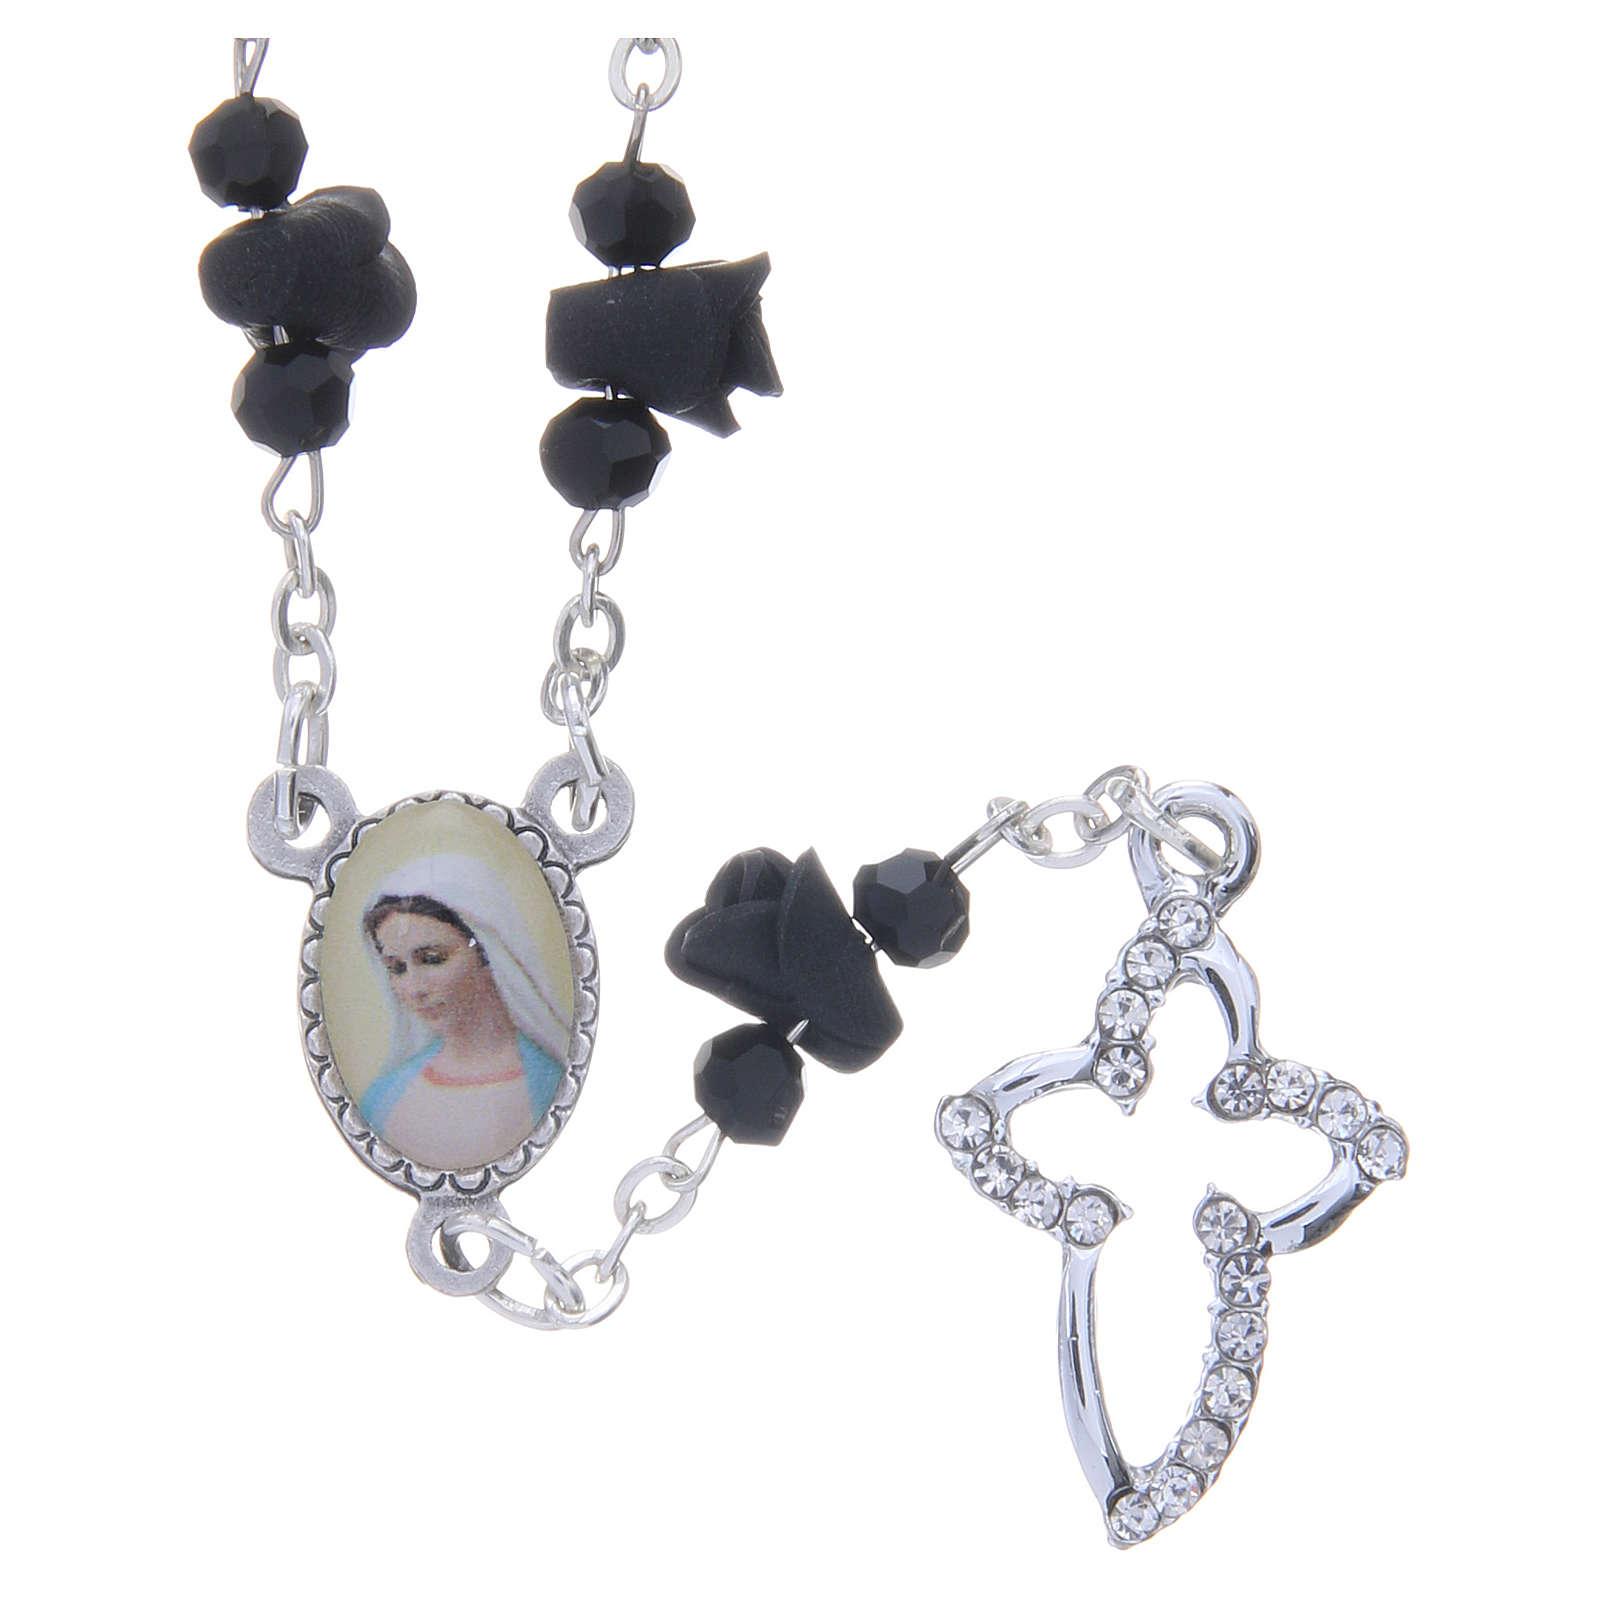 Collana rosario Medjugorje rose nere ceramica icona Madonna 4